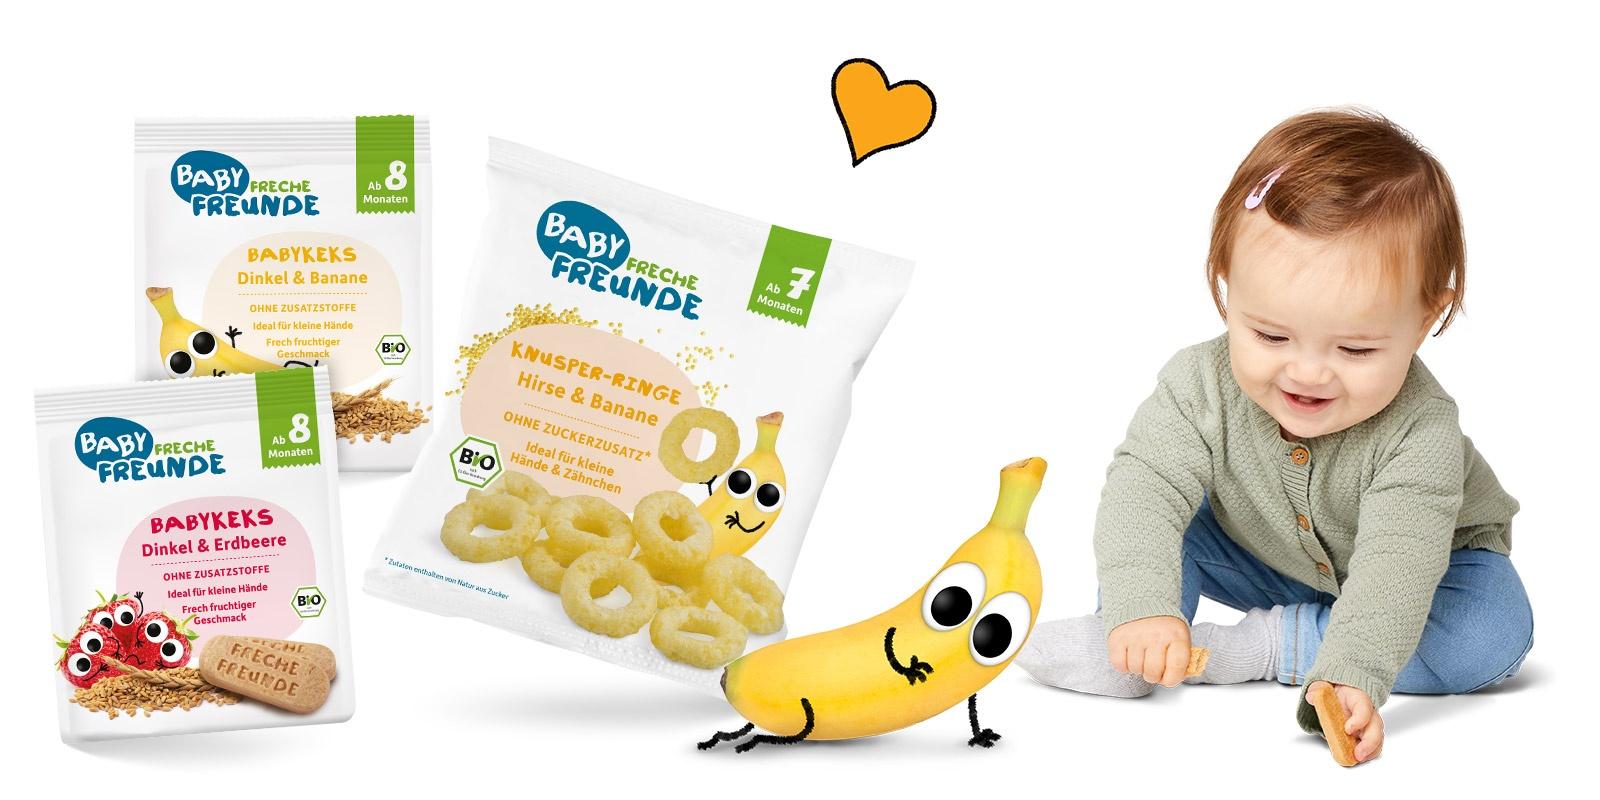 Baby Freche Freunde Kategorie Baby Snacks